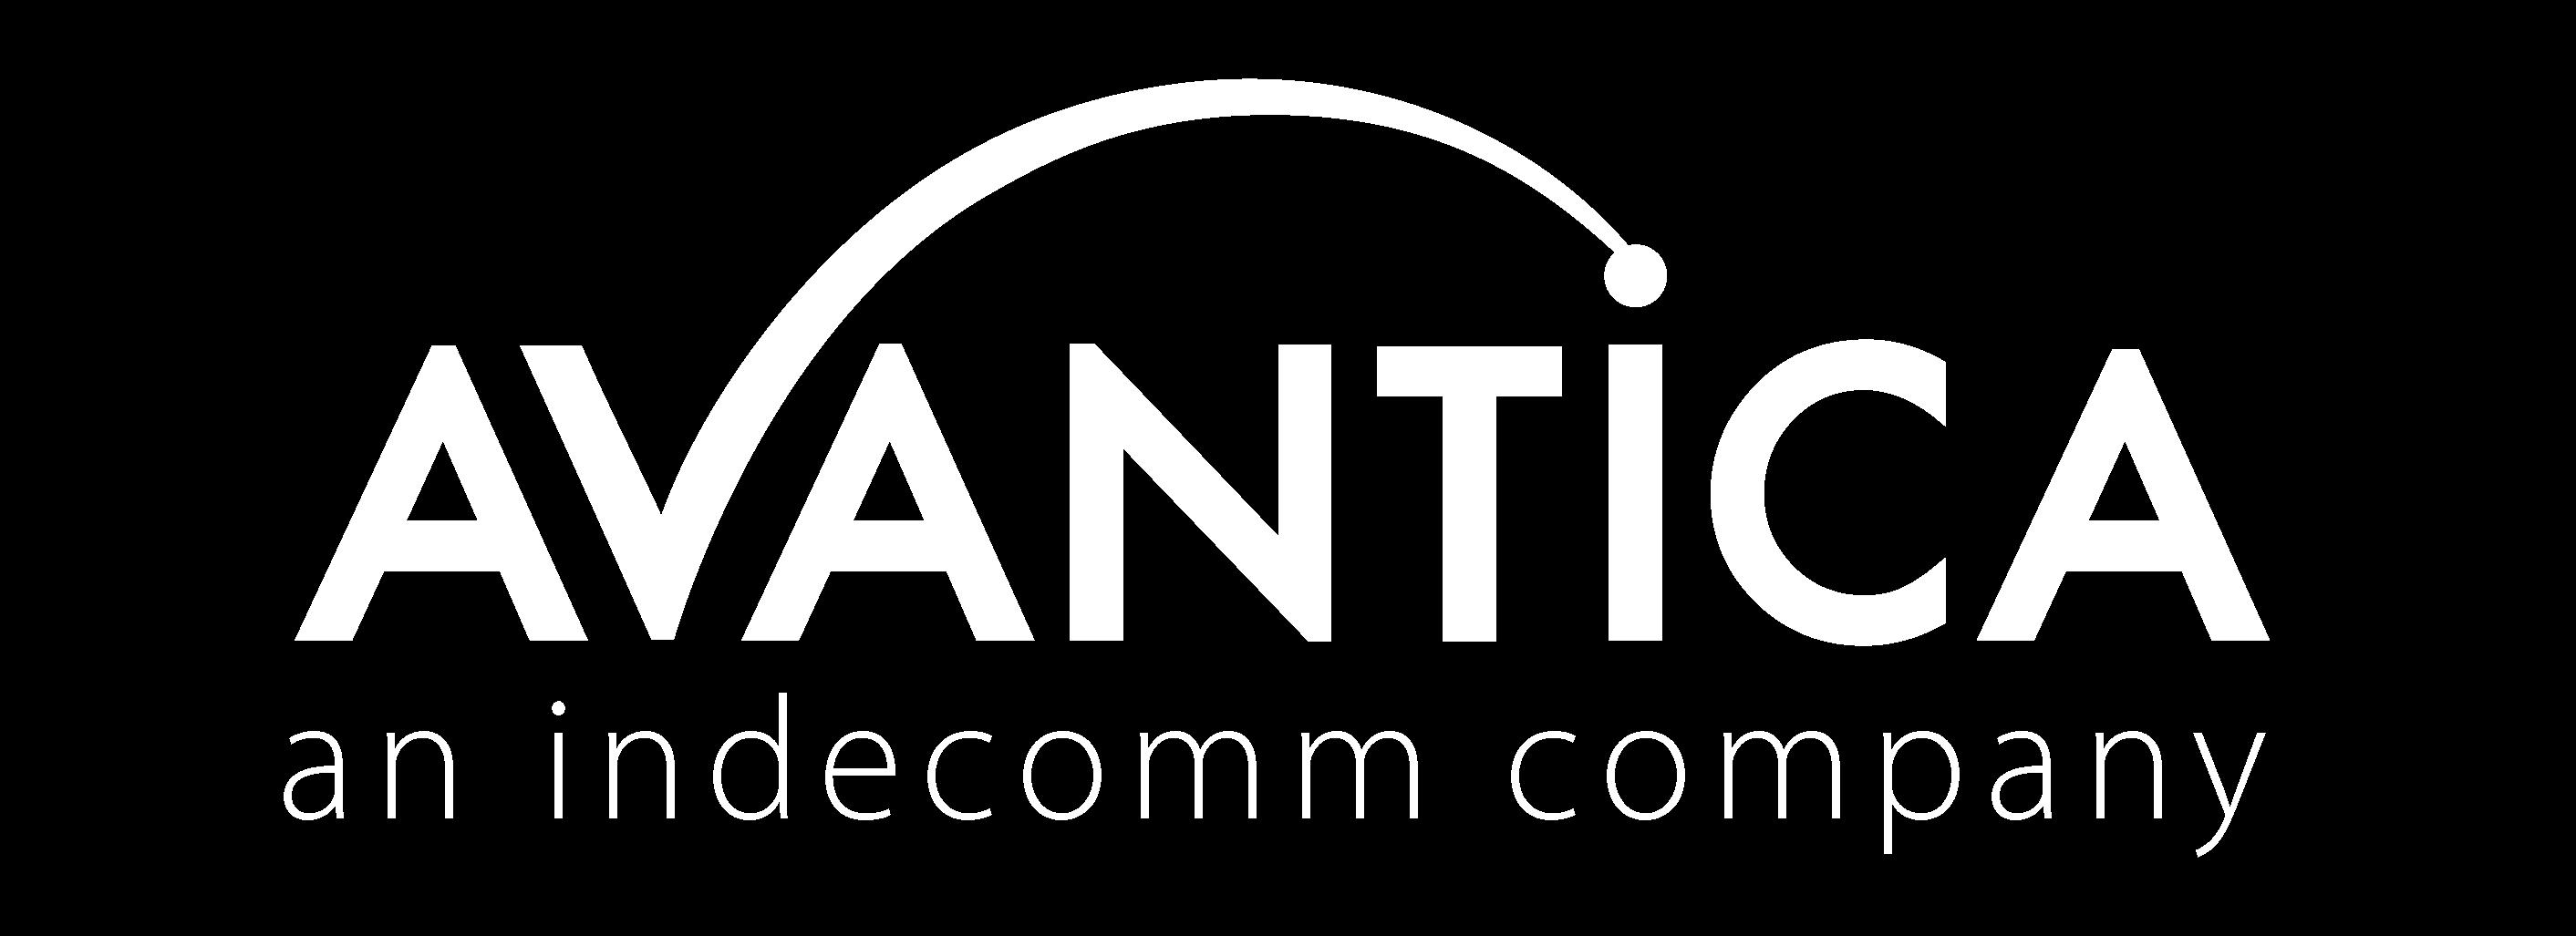 Avantica Technologies Avantest In 2020 Gaming Logos Logos Unframed Art Prints